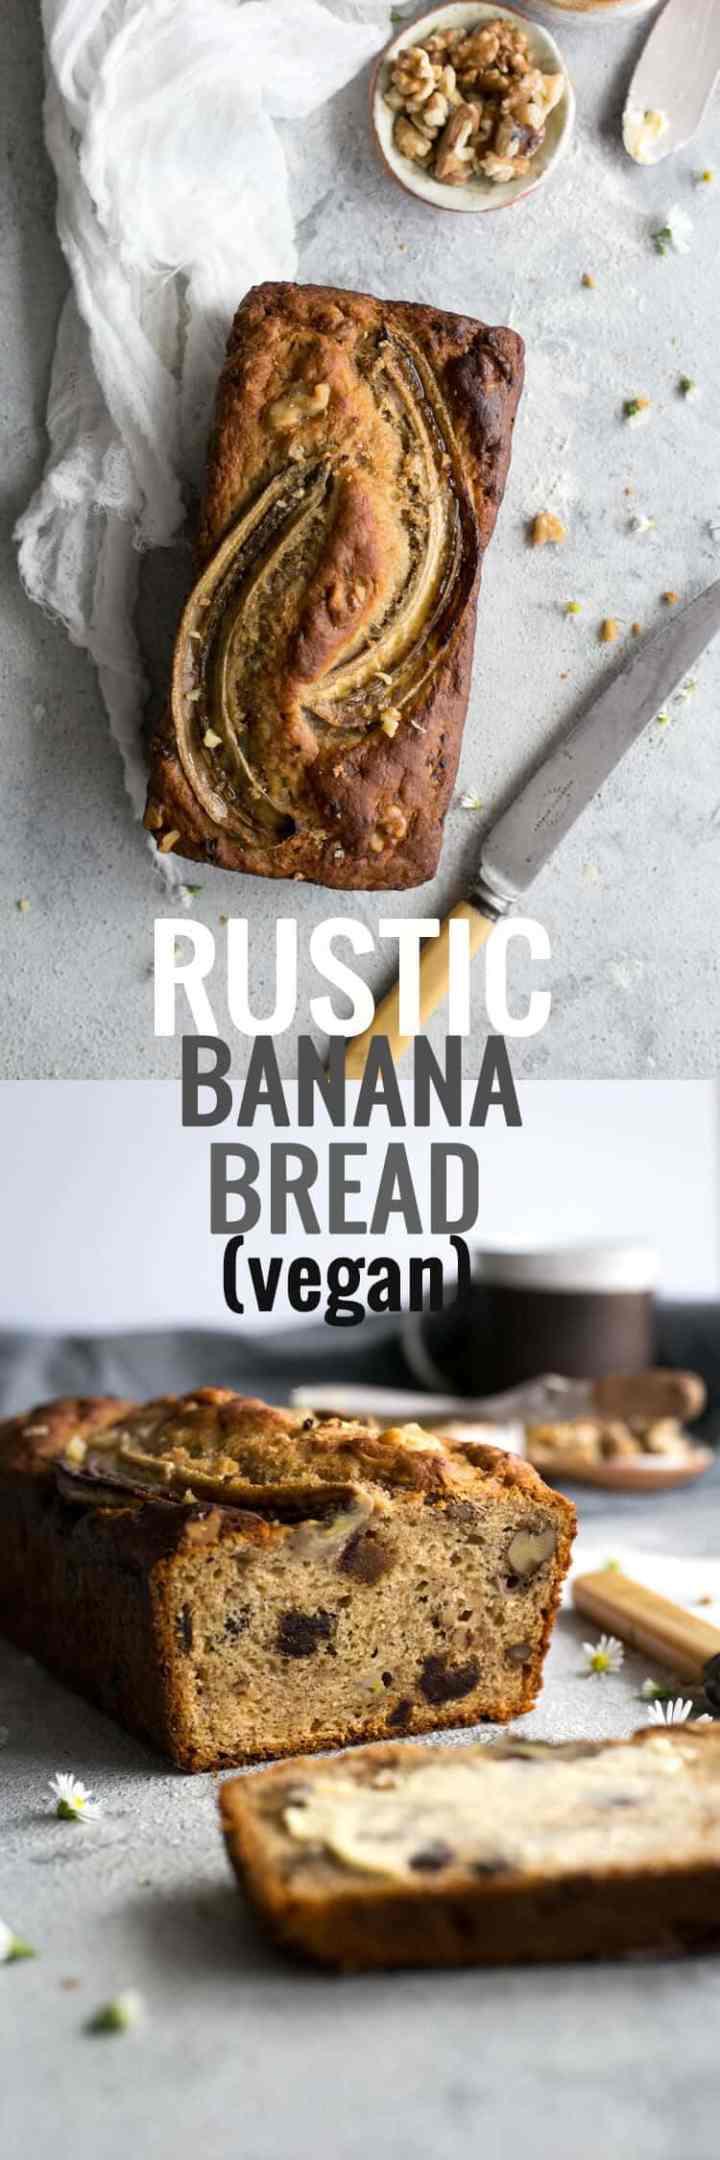 Delicious, rustic banana bread recipe, 100% vegan! | via @annabanana.co